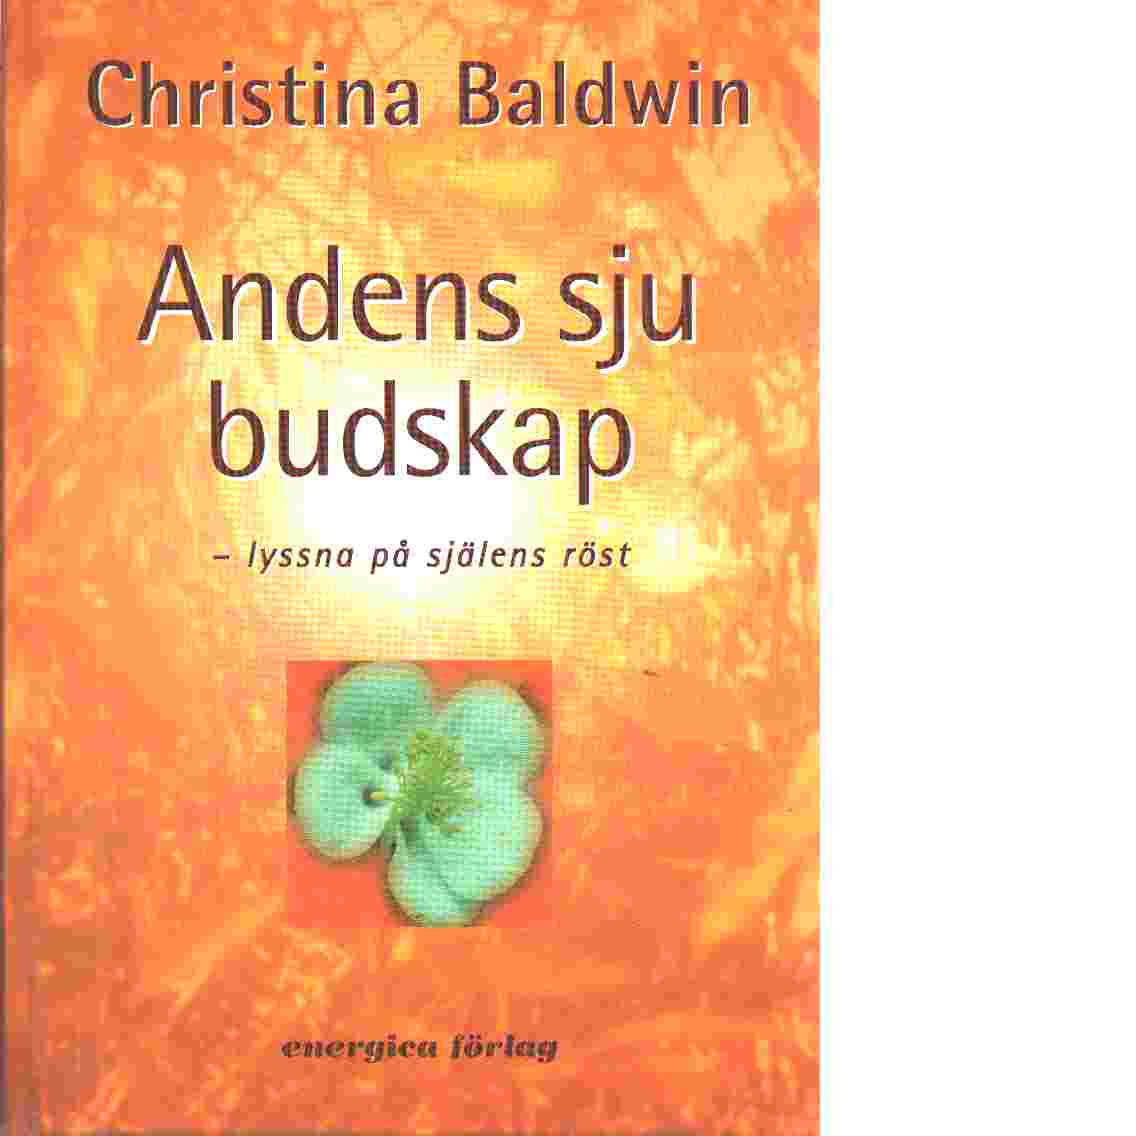 Andens sju budskap - Baldwin, Christina